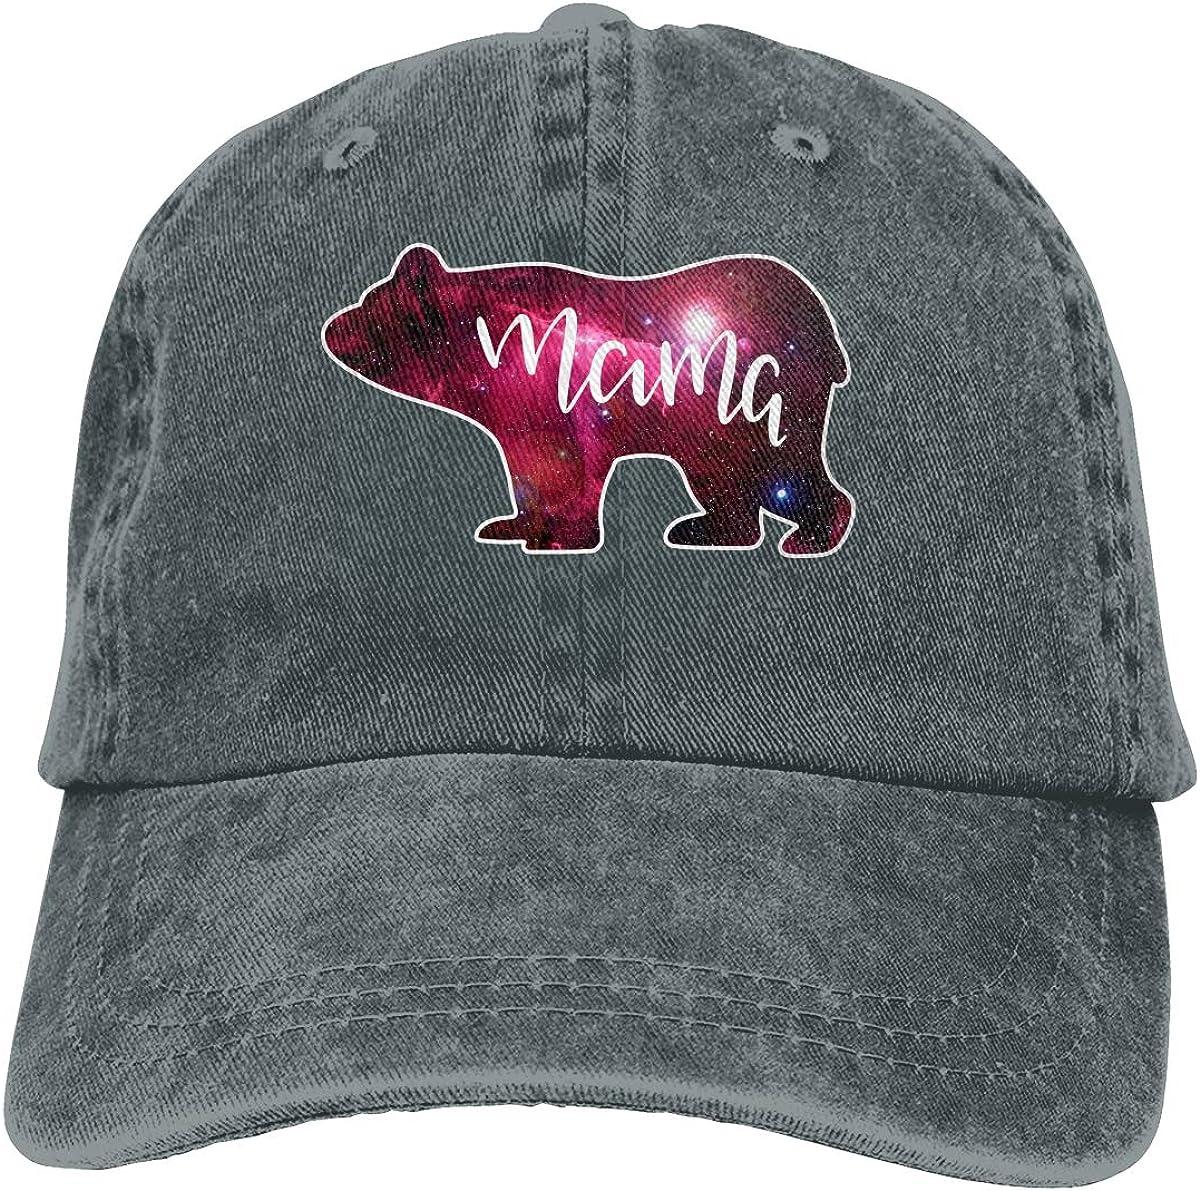 Galaxy Mama Bear Vintage Unisex Washed Cap Adjustable Dads Denim Stetson Hat